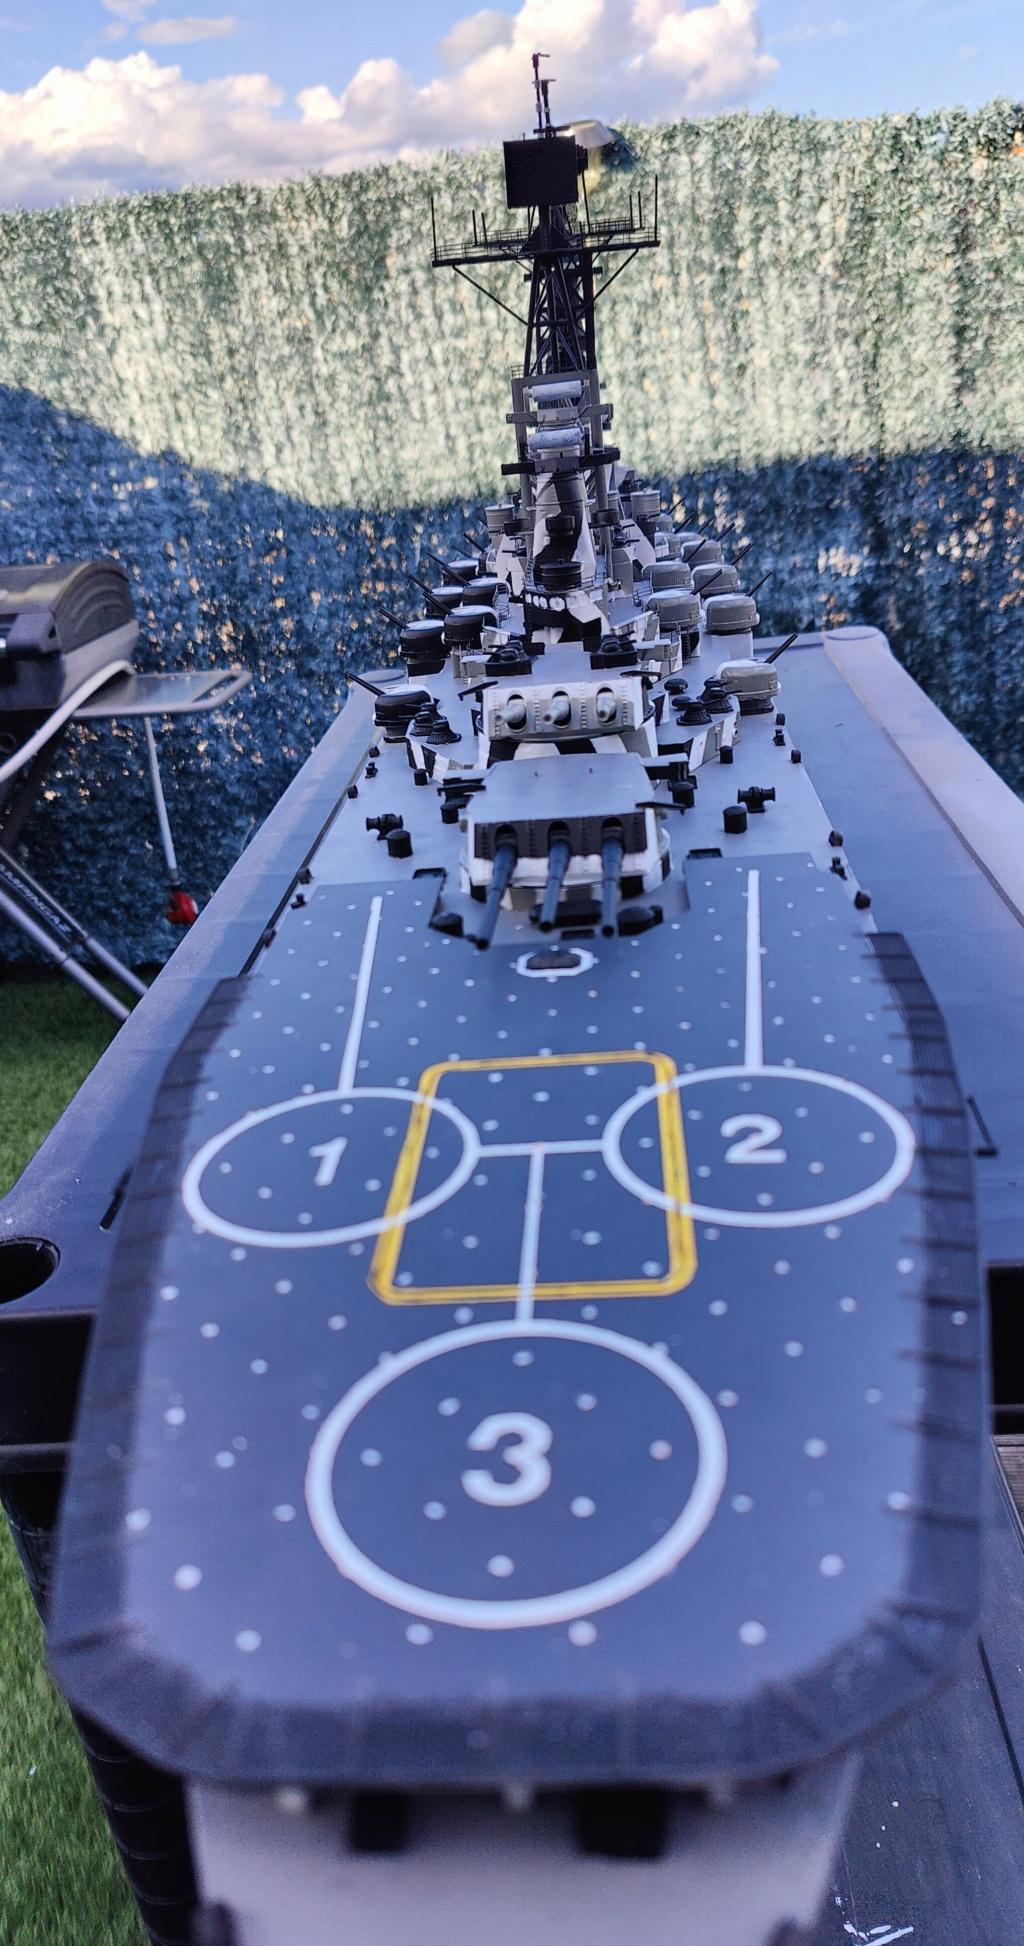 [Uchronie] USS Lake Michigan (base Iowa Trumpeter 1/200°) par hibikitokay - Page 7 Img_2119